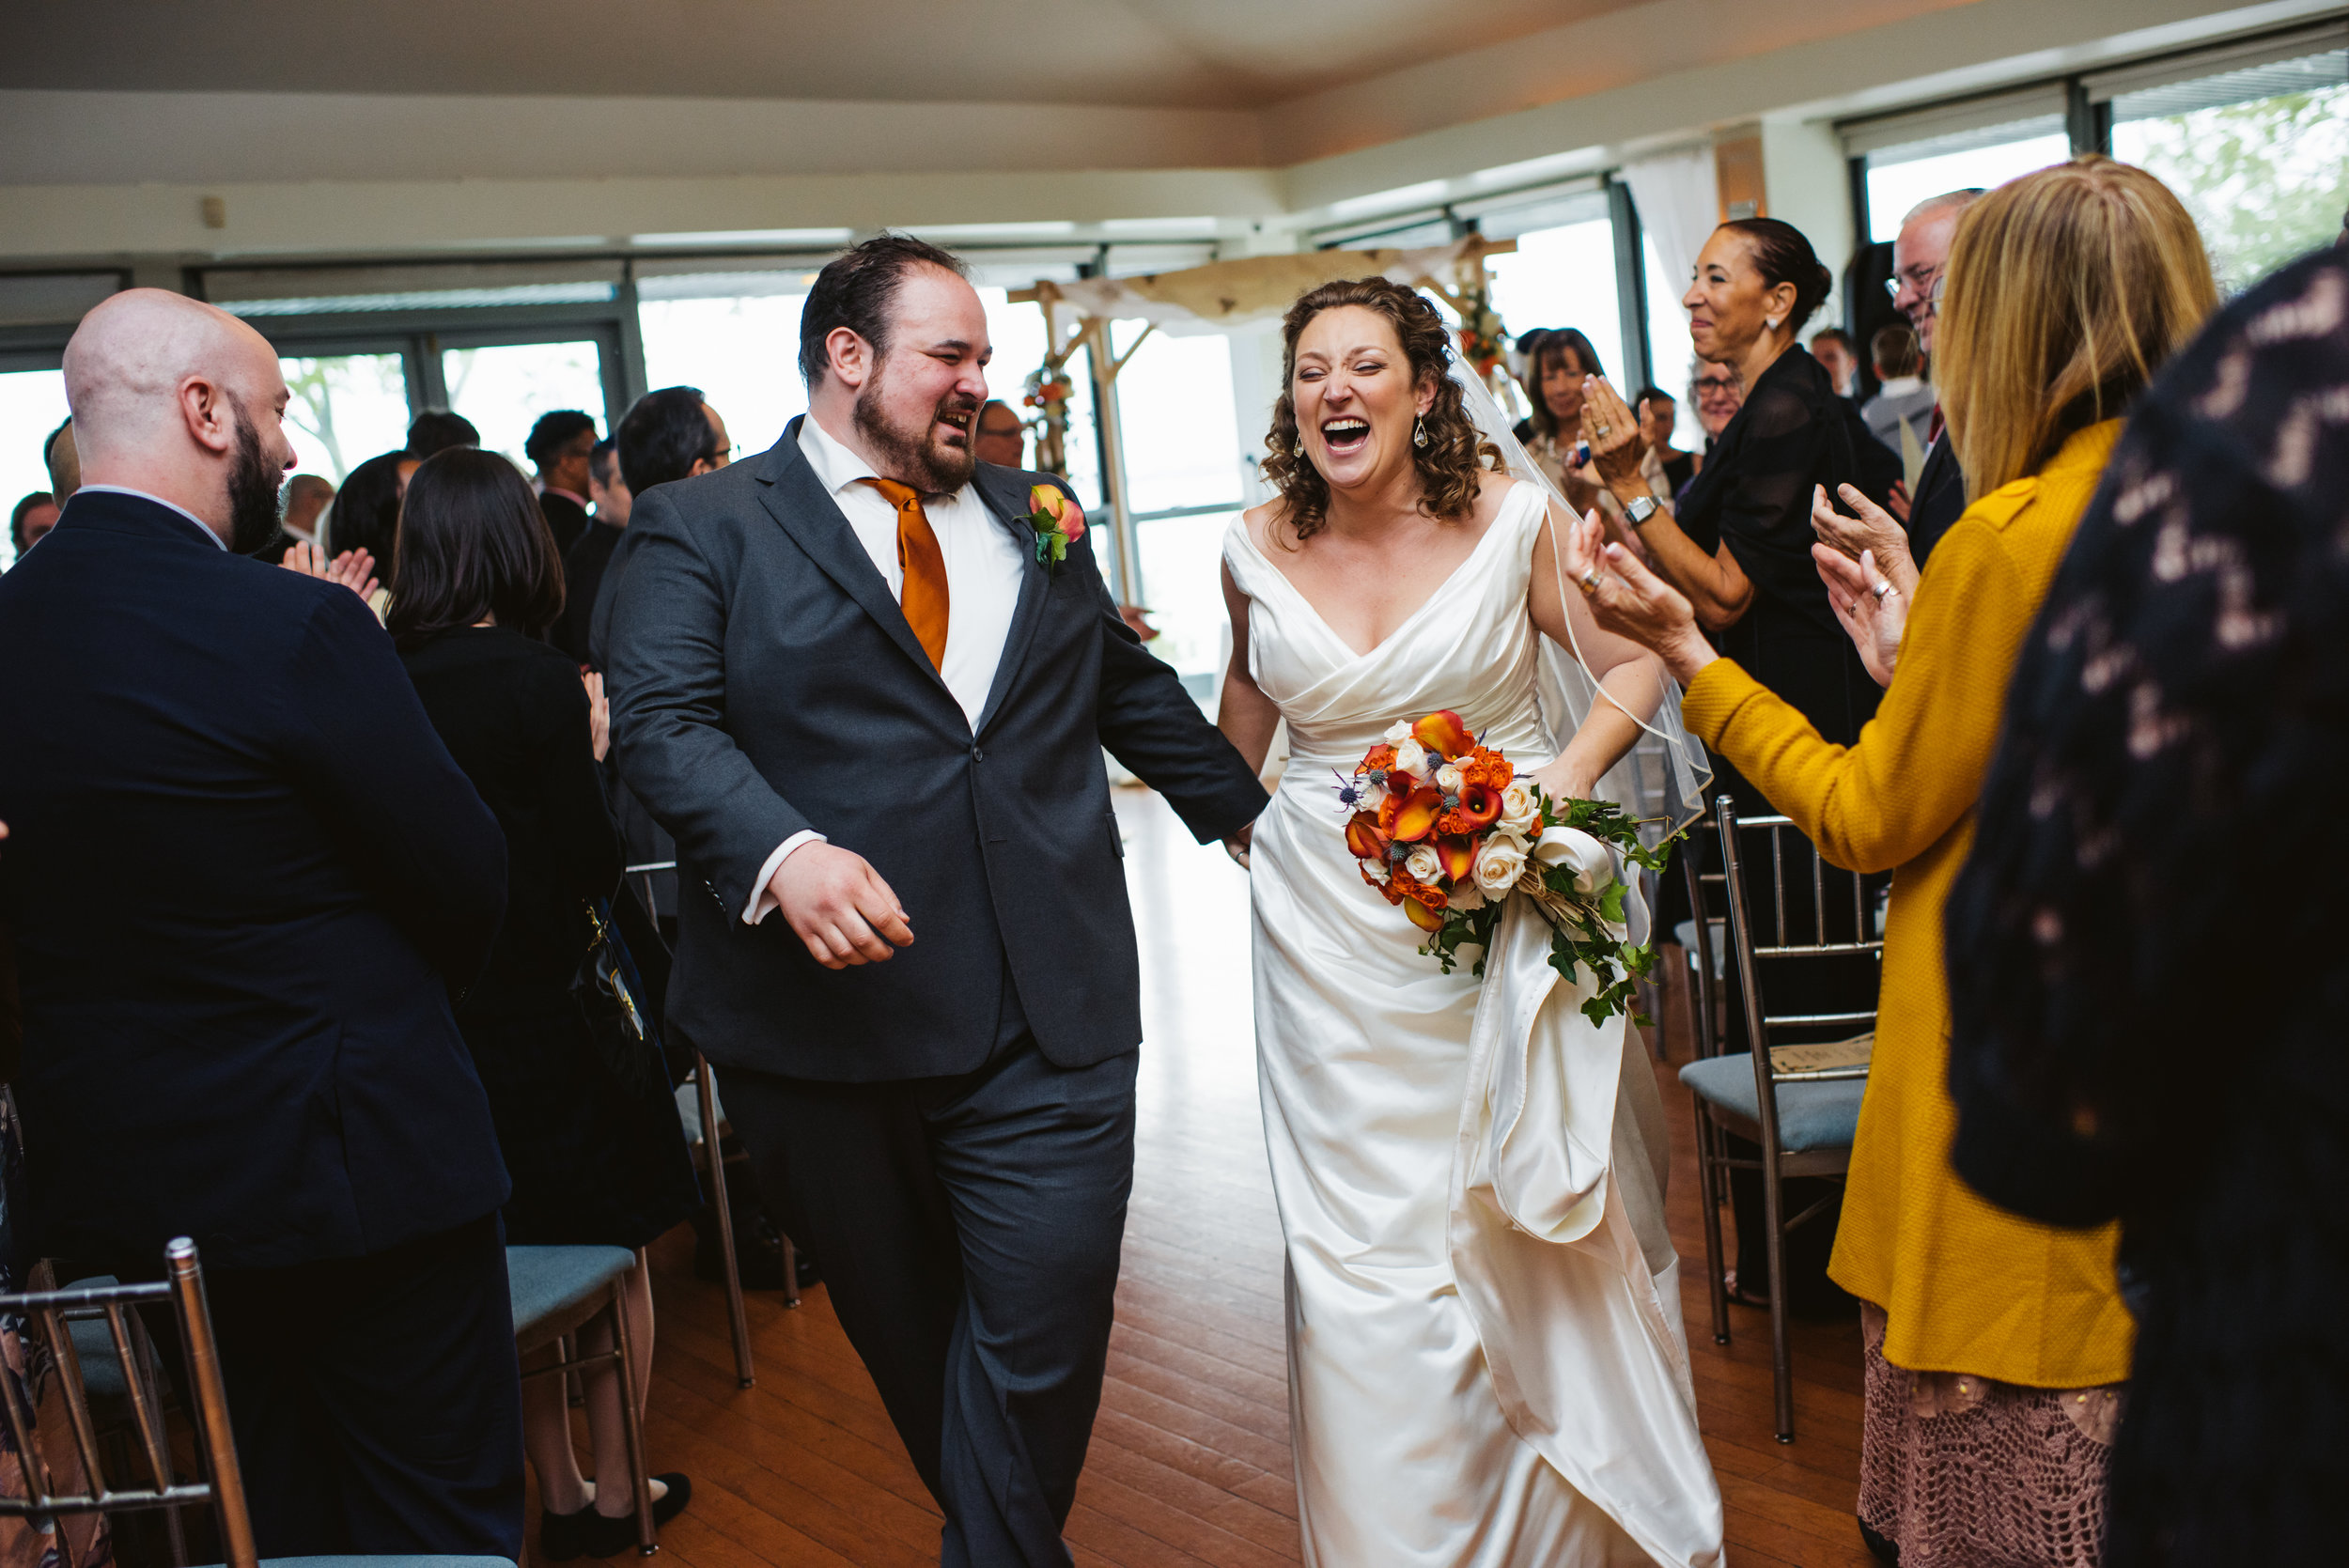 LIZA & JON - BATTERY PARK WEDDING - NYC INTIMATE WEDDING PHOTOGRAPHER - CHI-CHI AGBIM-492.jpg